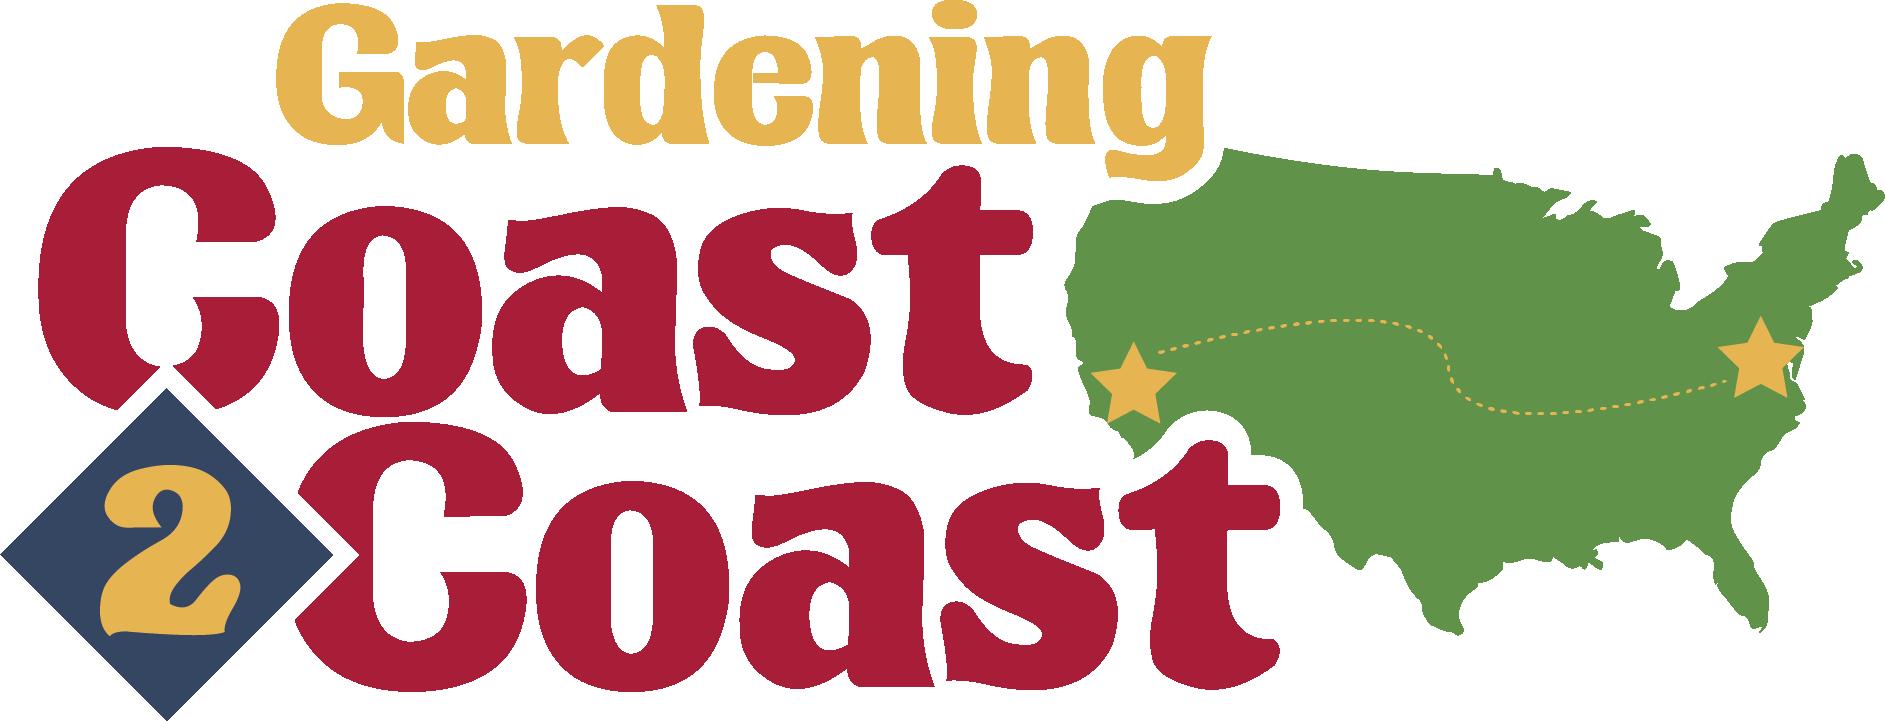 Gardening Coast 2 Coast